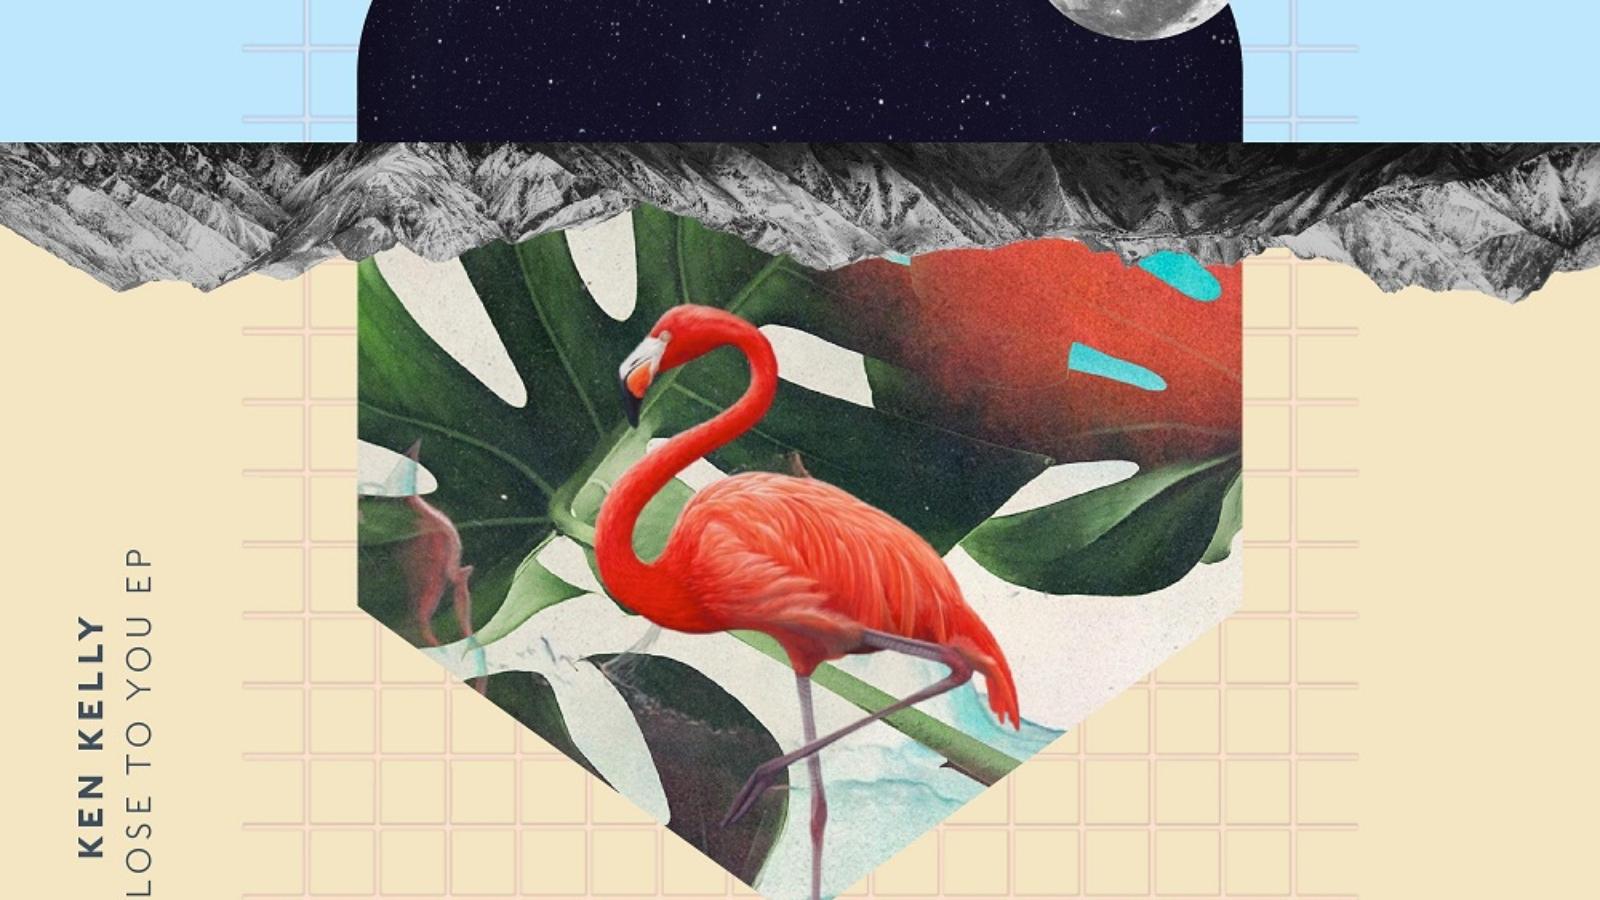 Ken_Kelly_-_Close_To_You_artwork